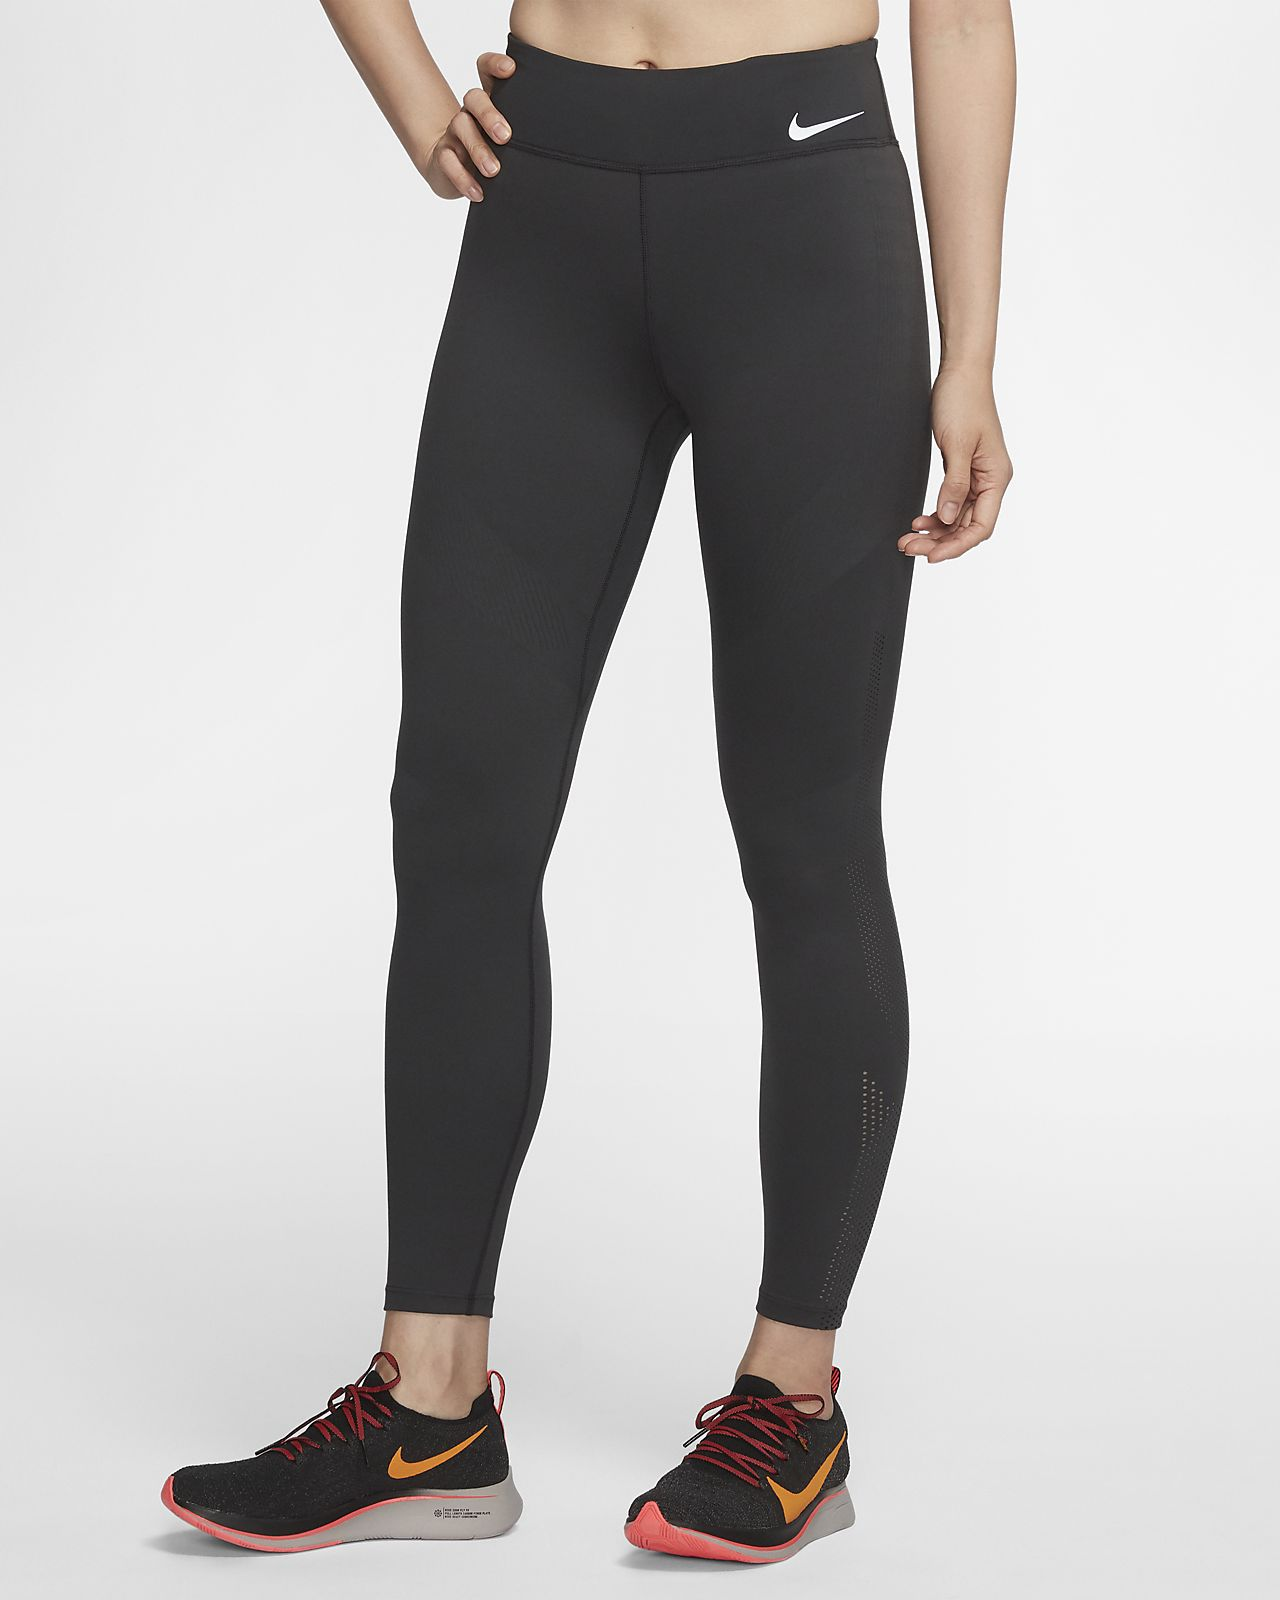 Nike Techknit Epic Lux 女子跑步紧身裤